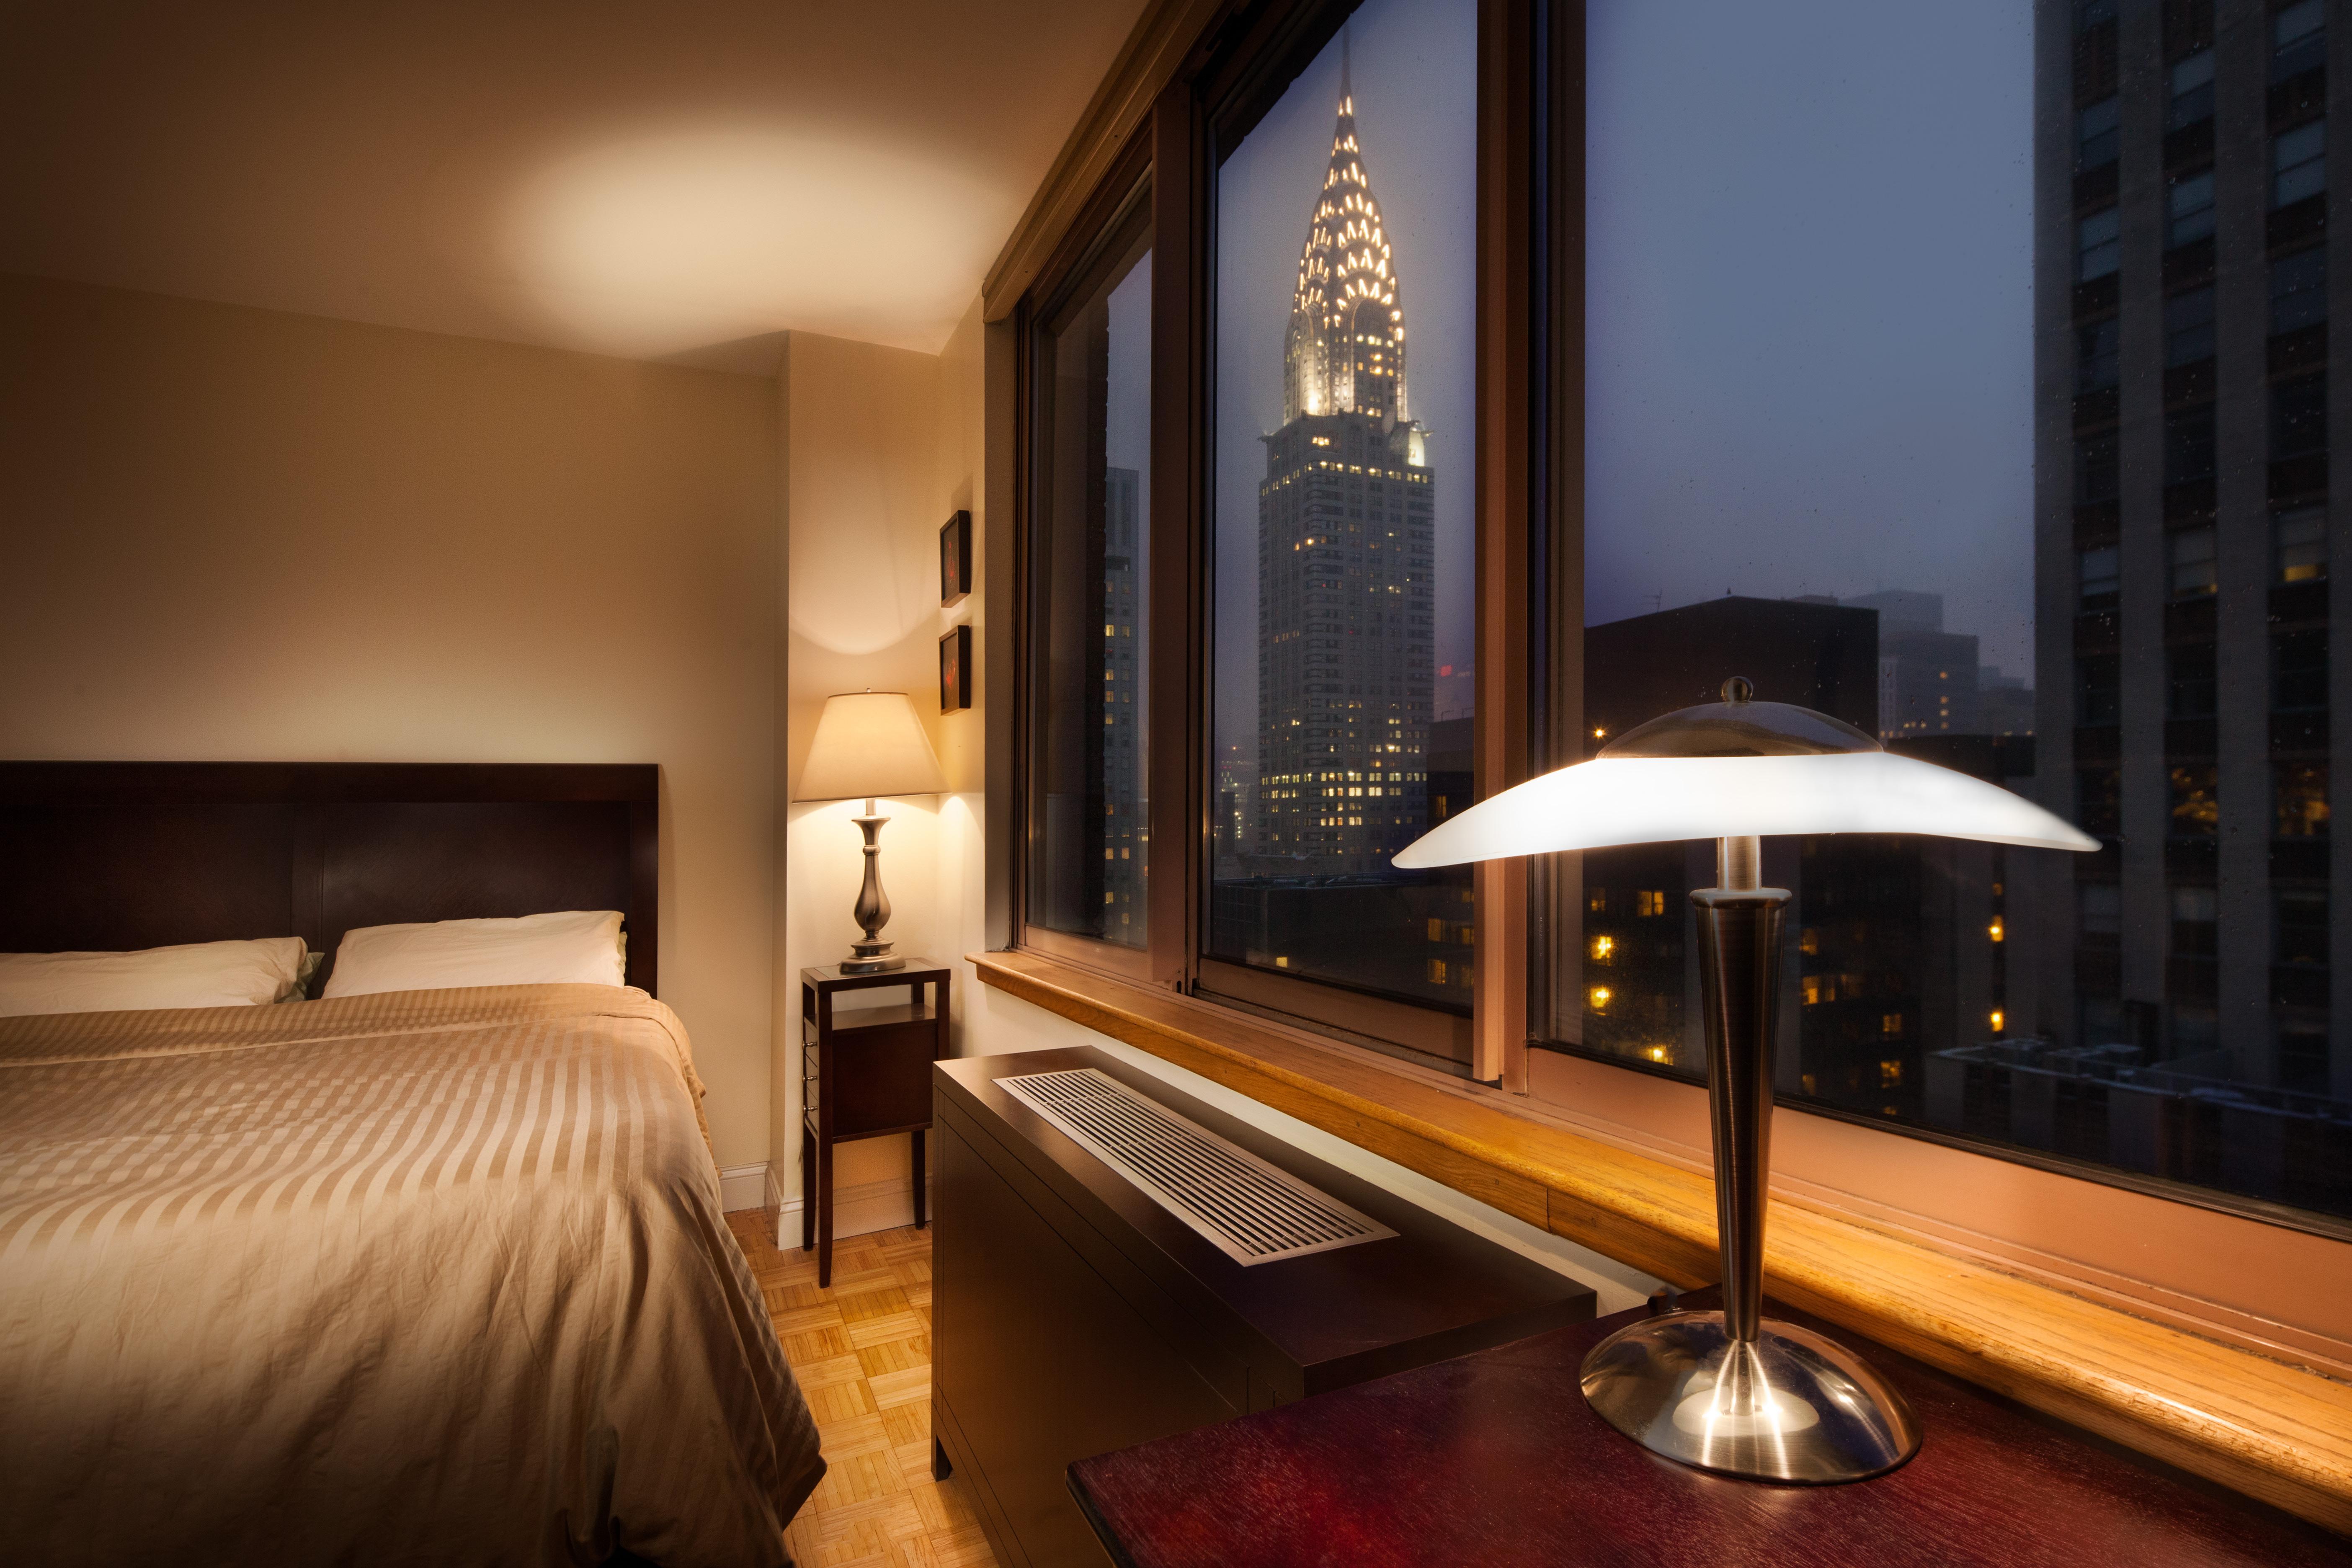 Wallpaper : new, York, city, building, window, skyline ...